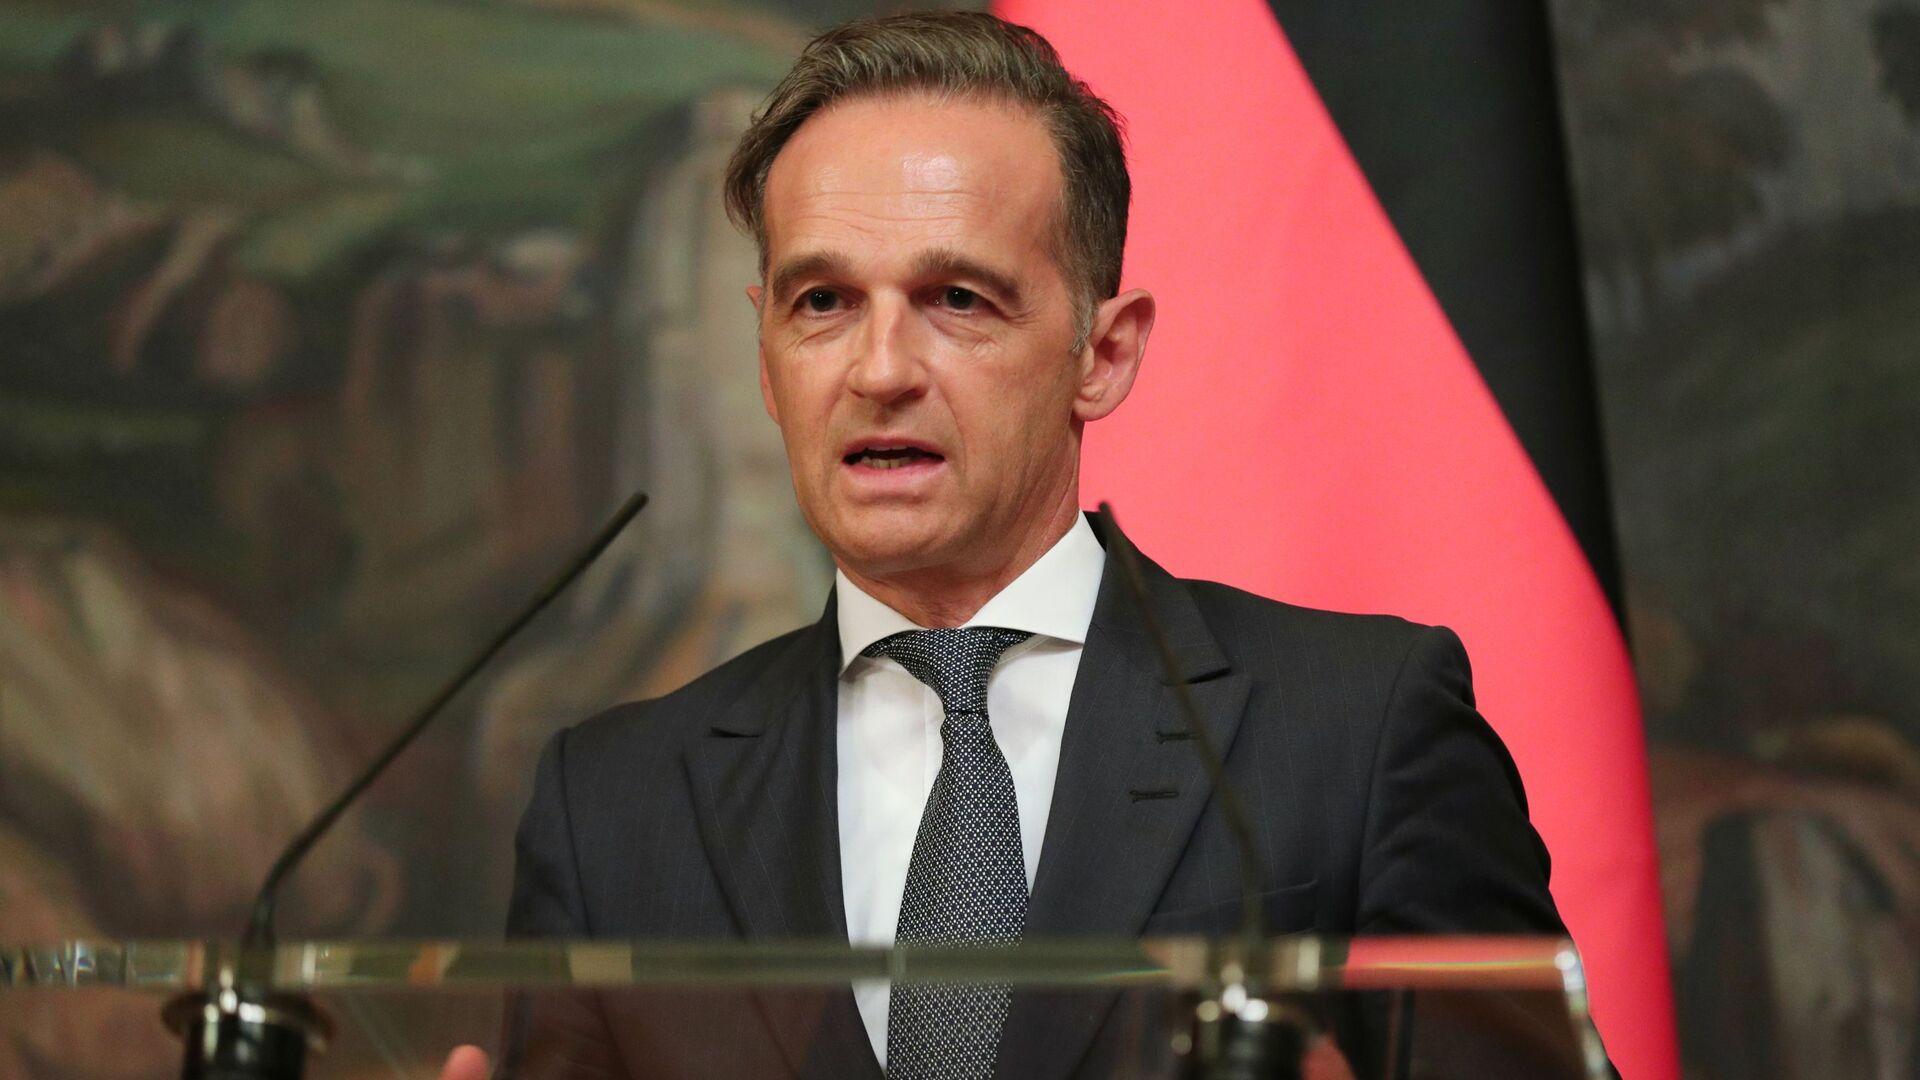 Heiko Maas, el ministro de Asuntos Exteriores alemán - Sputnik Mundo, 1920, 12.07.2021